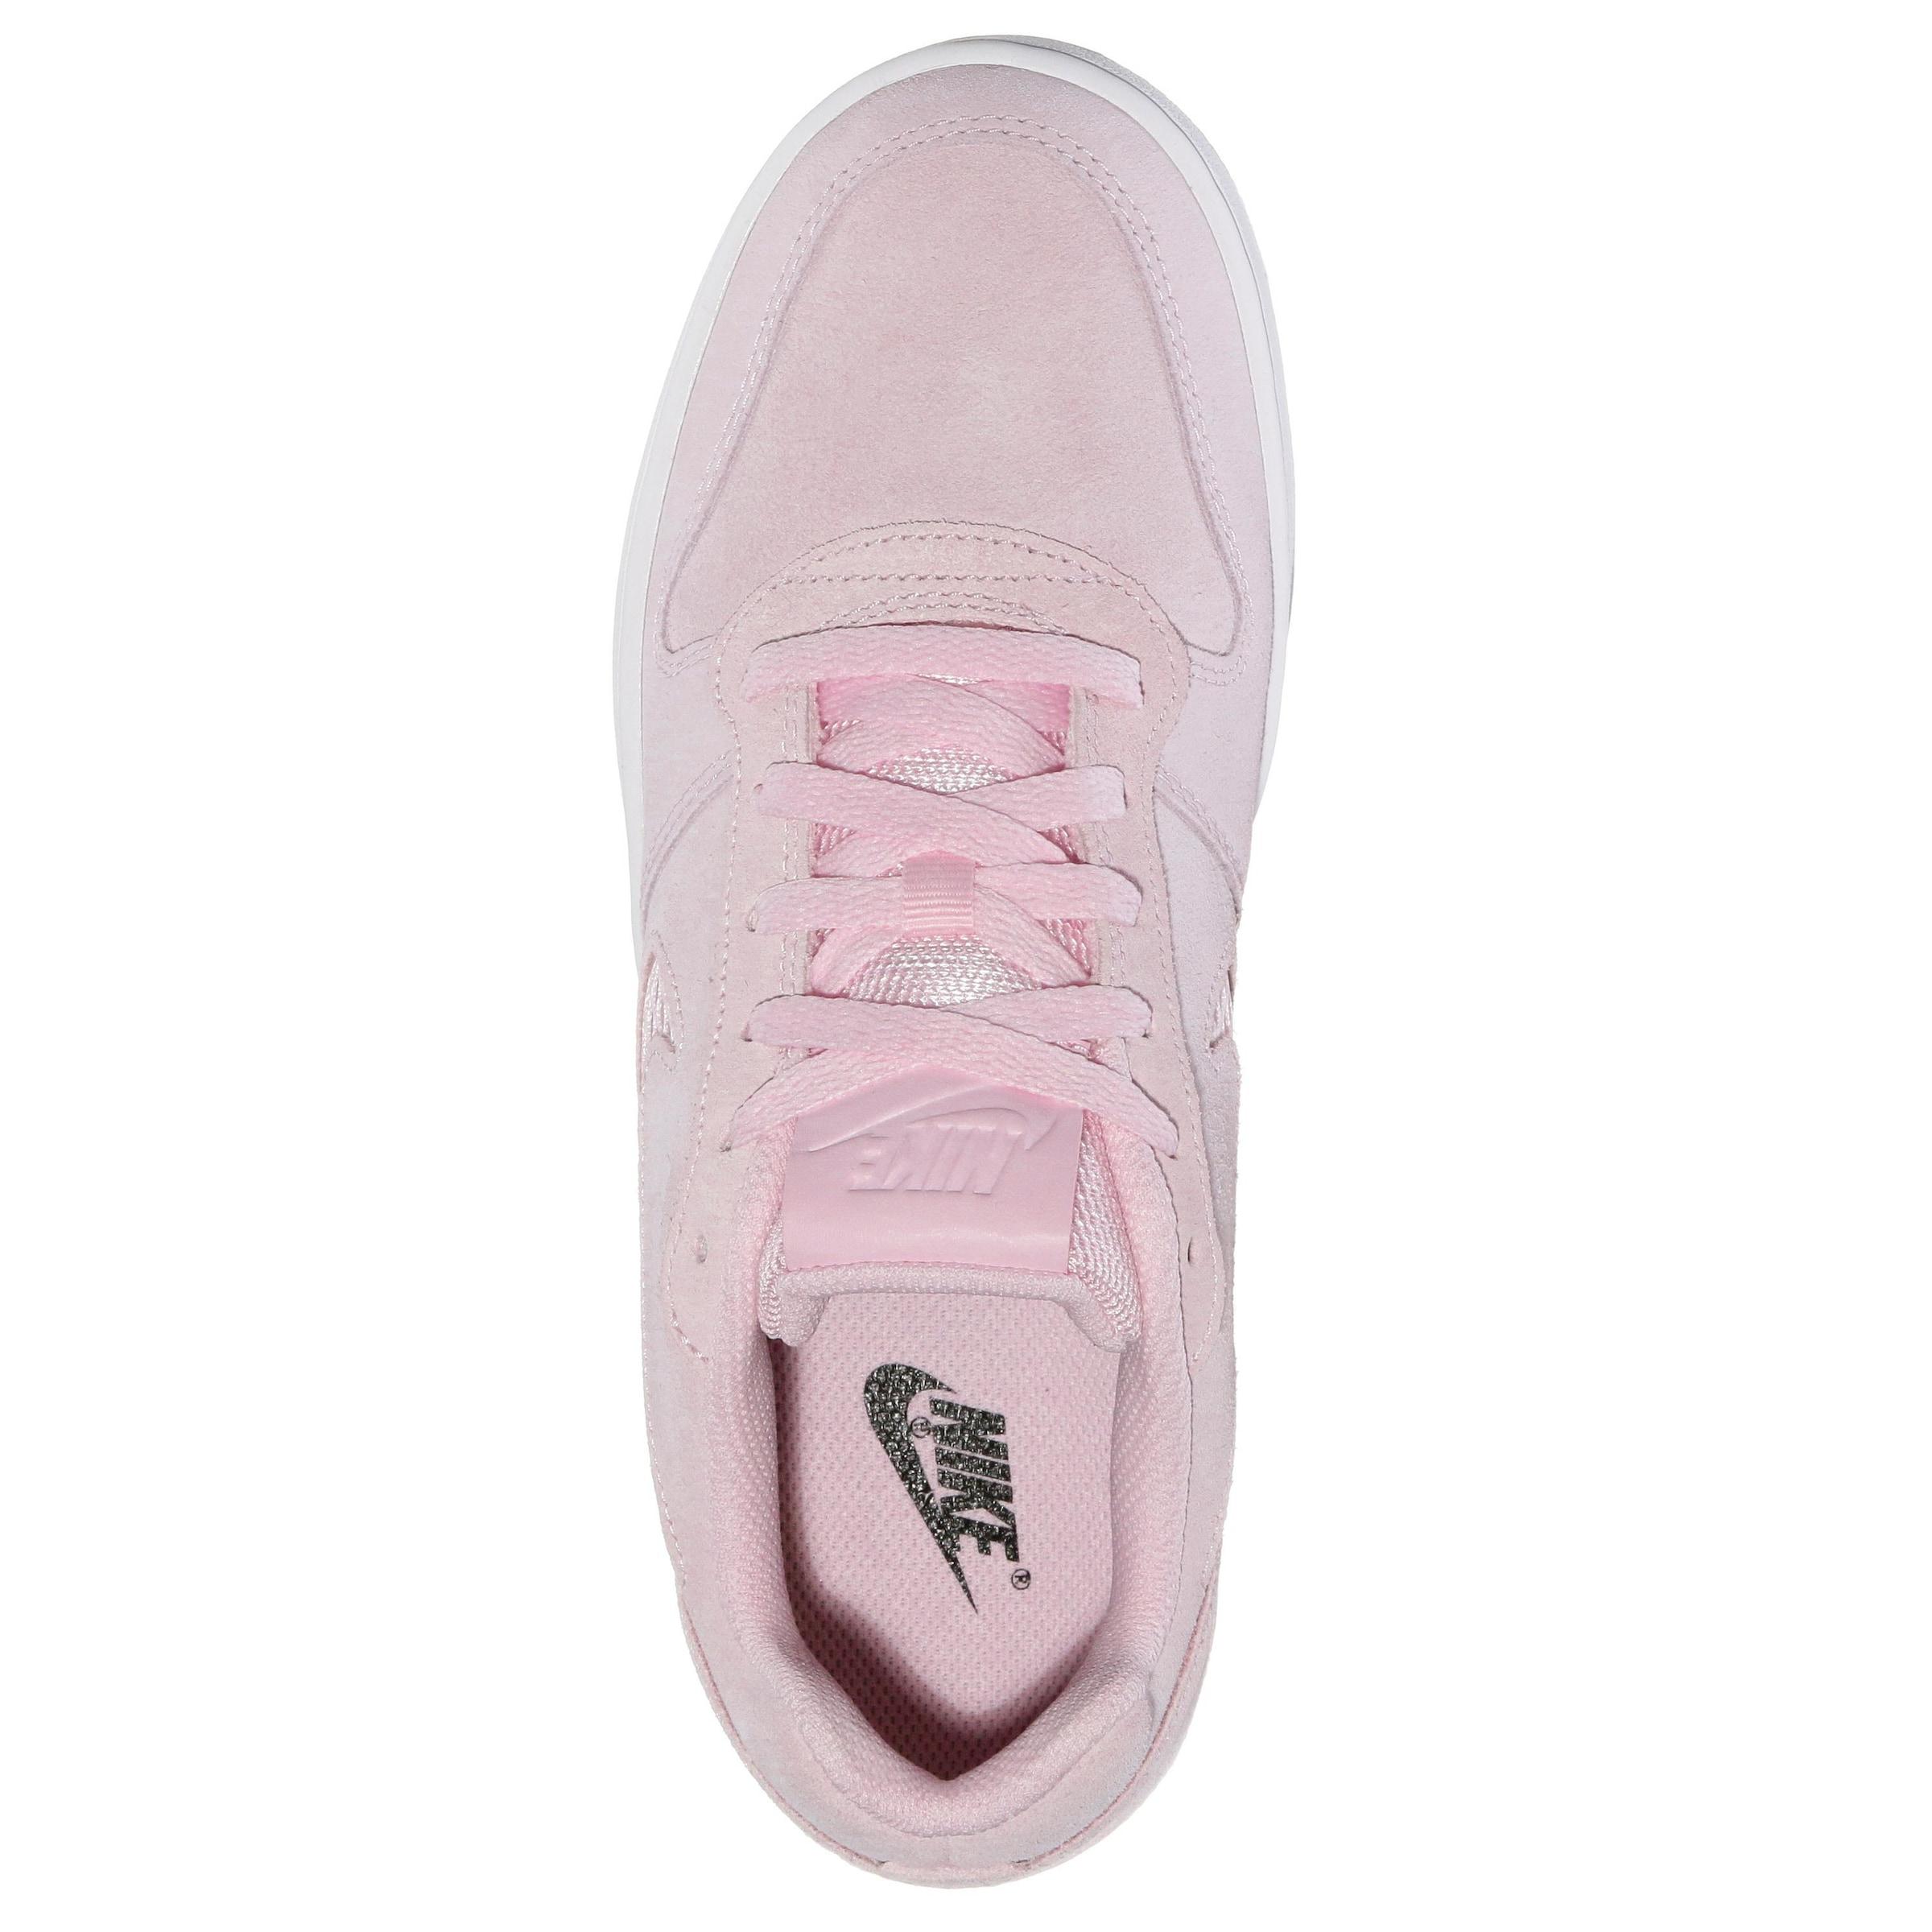 Nike Sportswear Turnschuhe 'Ebernon 'Ebernon 'Ebernon Lässig wild 0091de